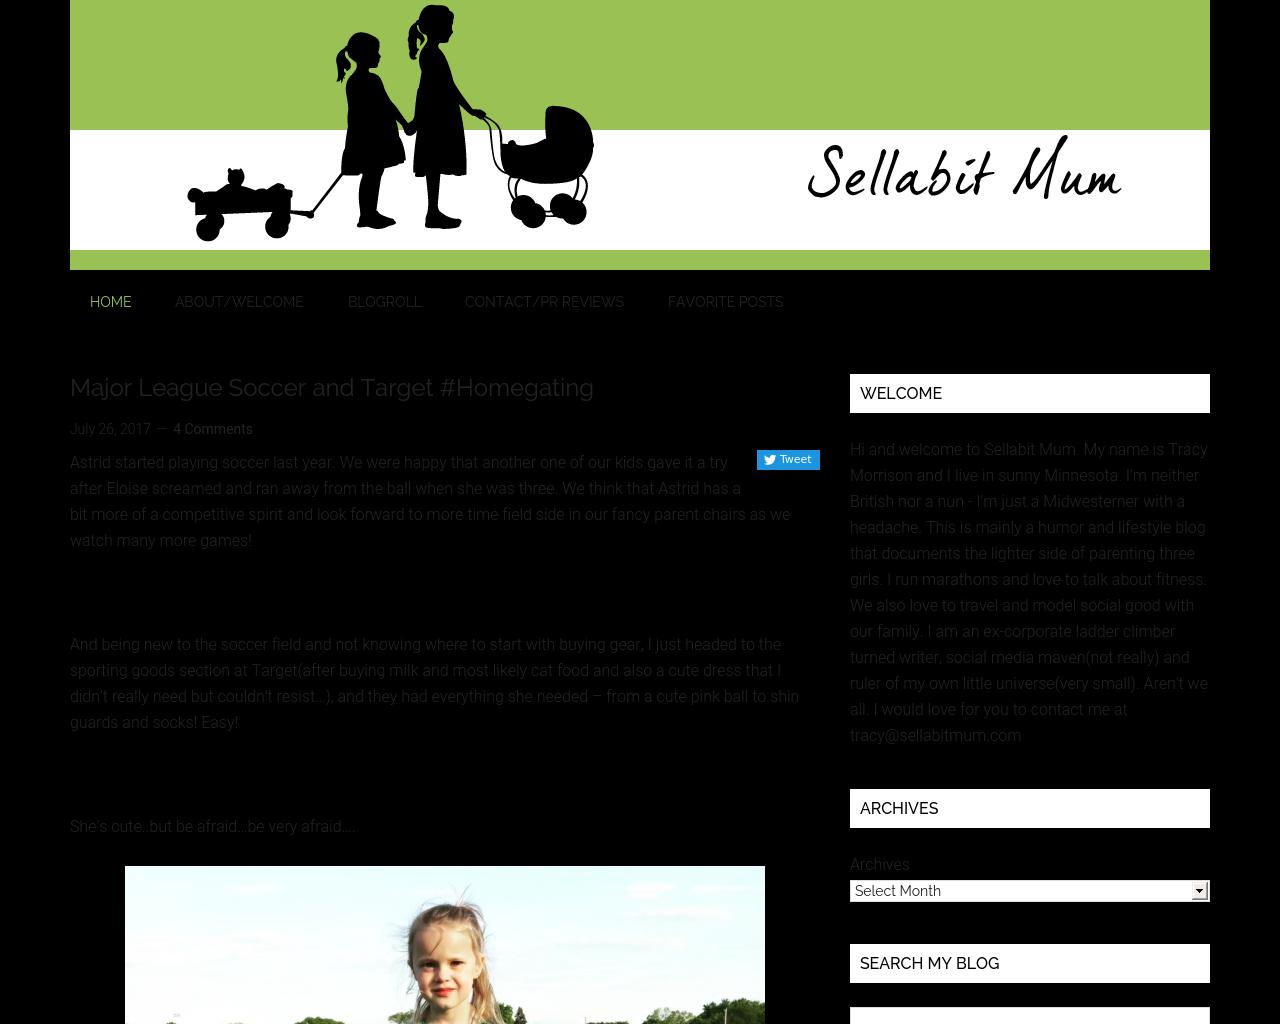 Sellabit-Mum-Advertising-Reviews-Pricing